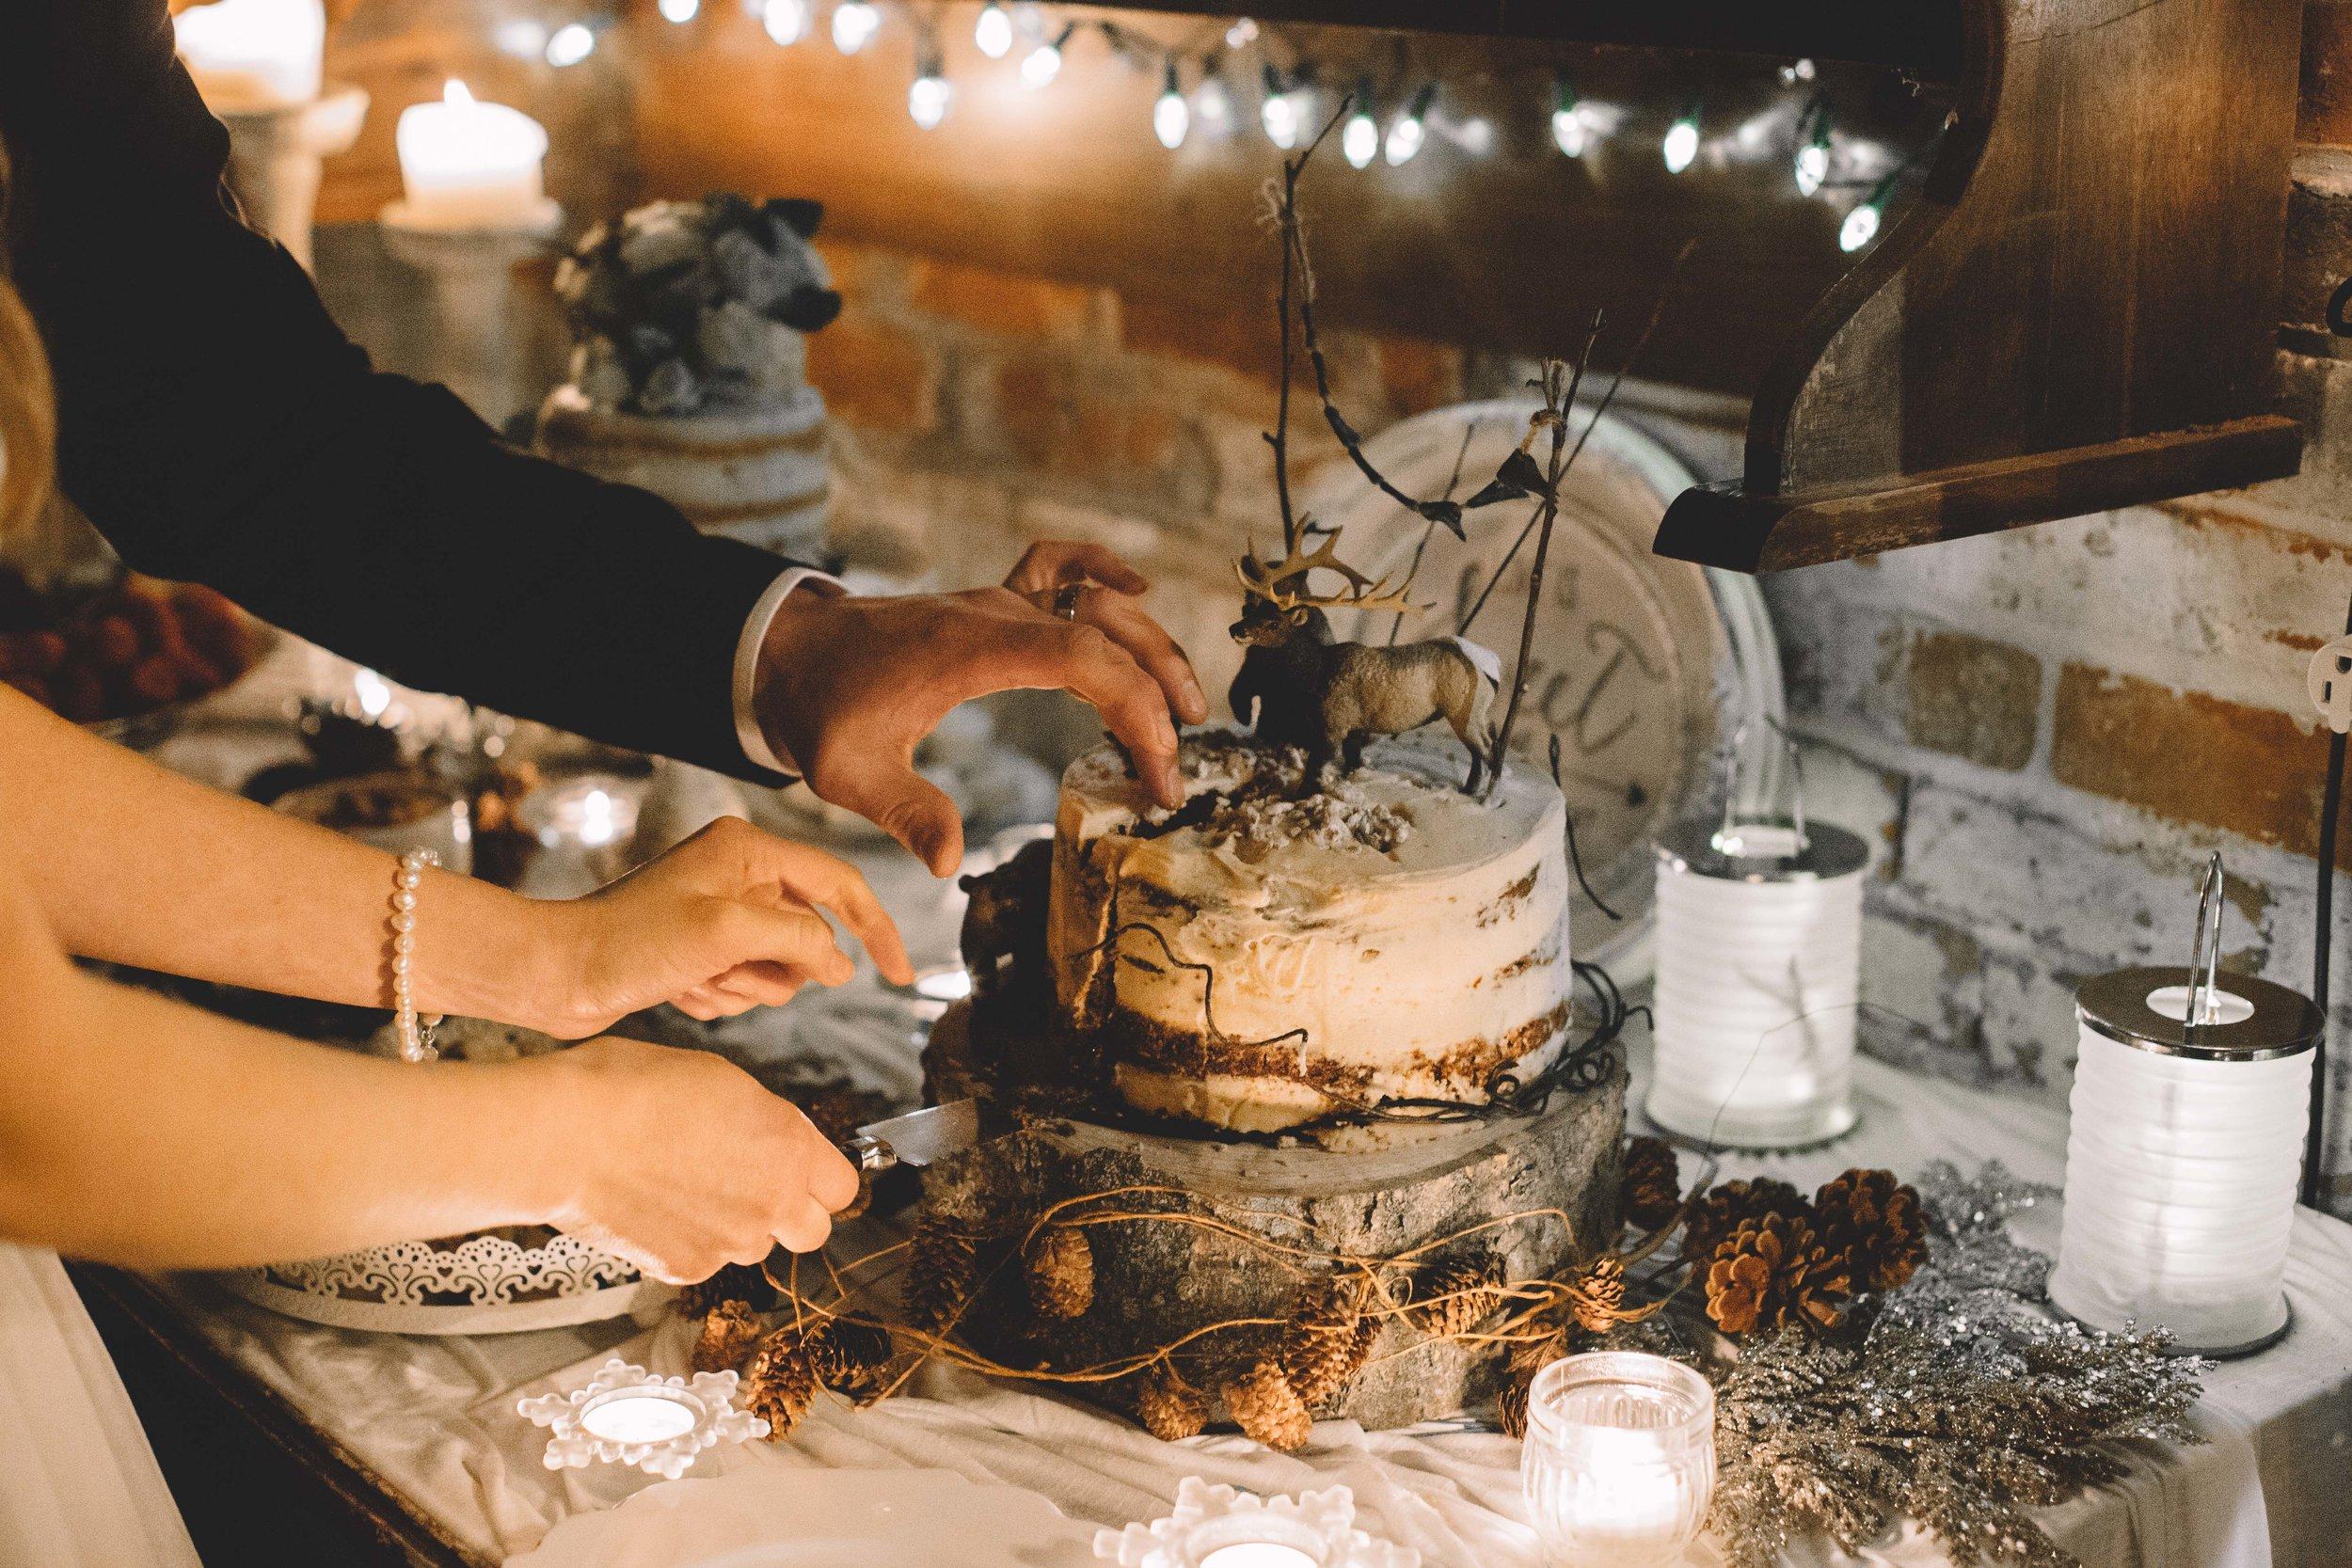 Jake + Brittney Balbas Airbnb Carriage House Wedding Evansville IN (409 of 426).jpg